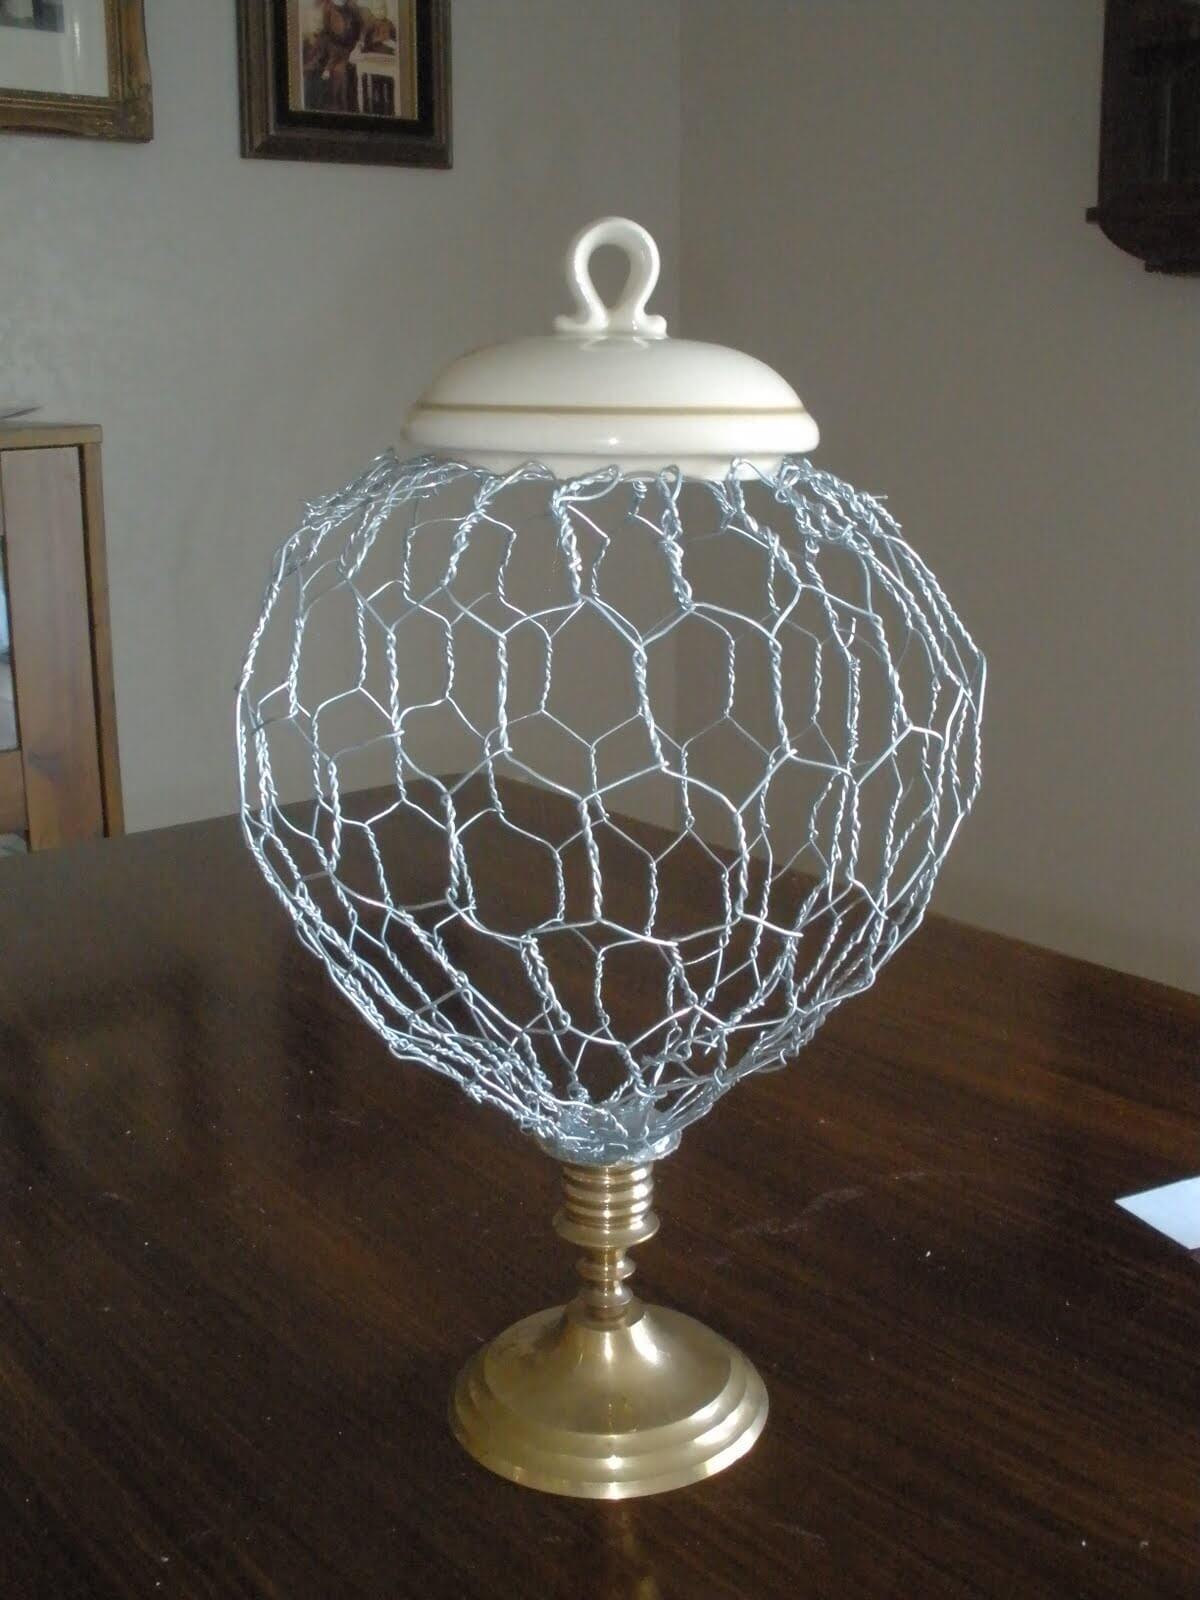 Make Your Own Globe Centerpiece